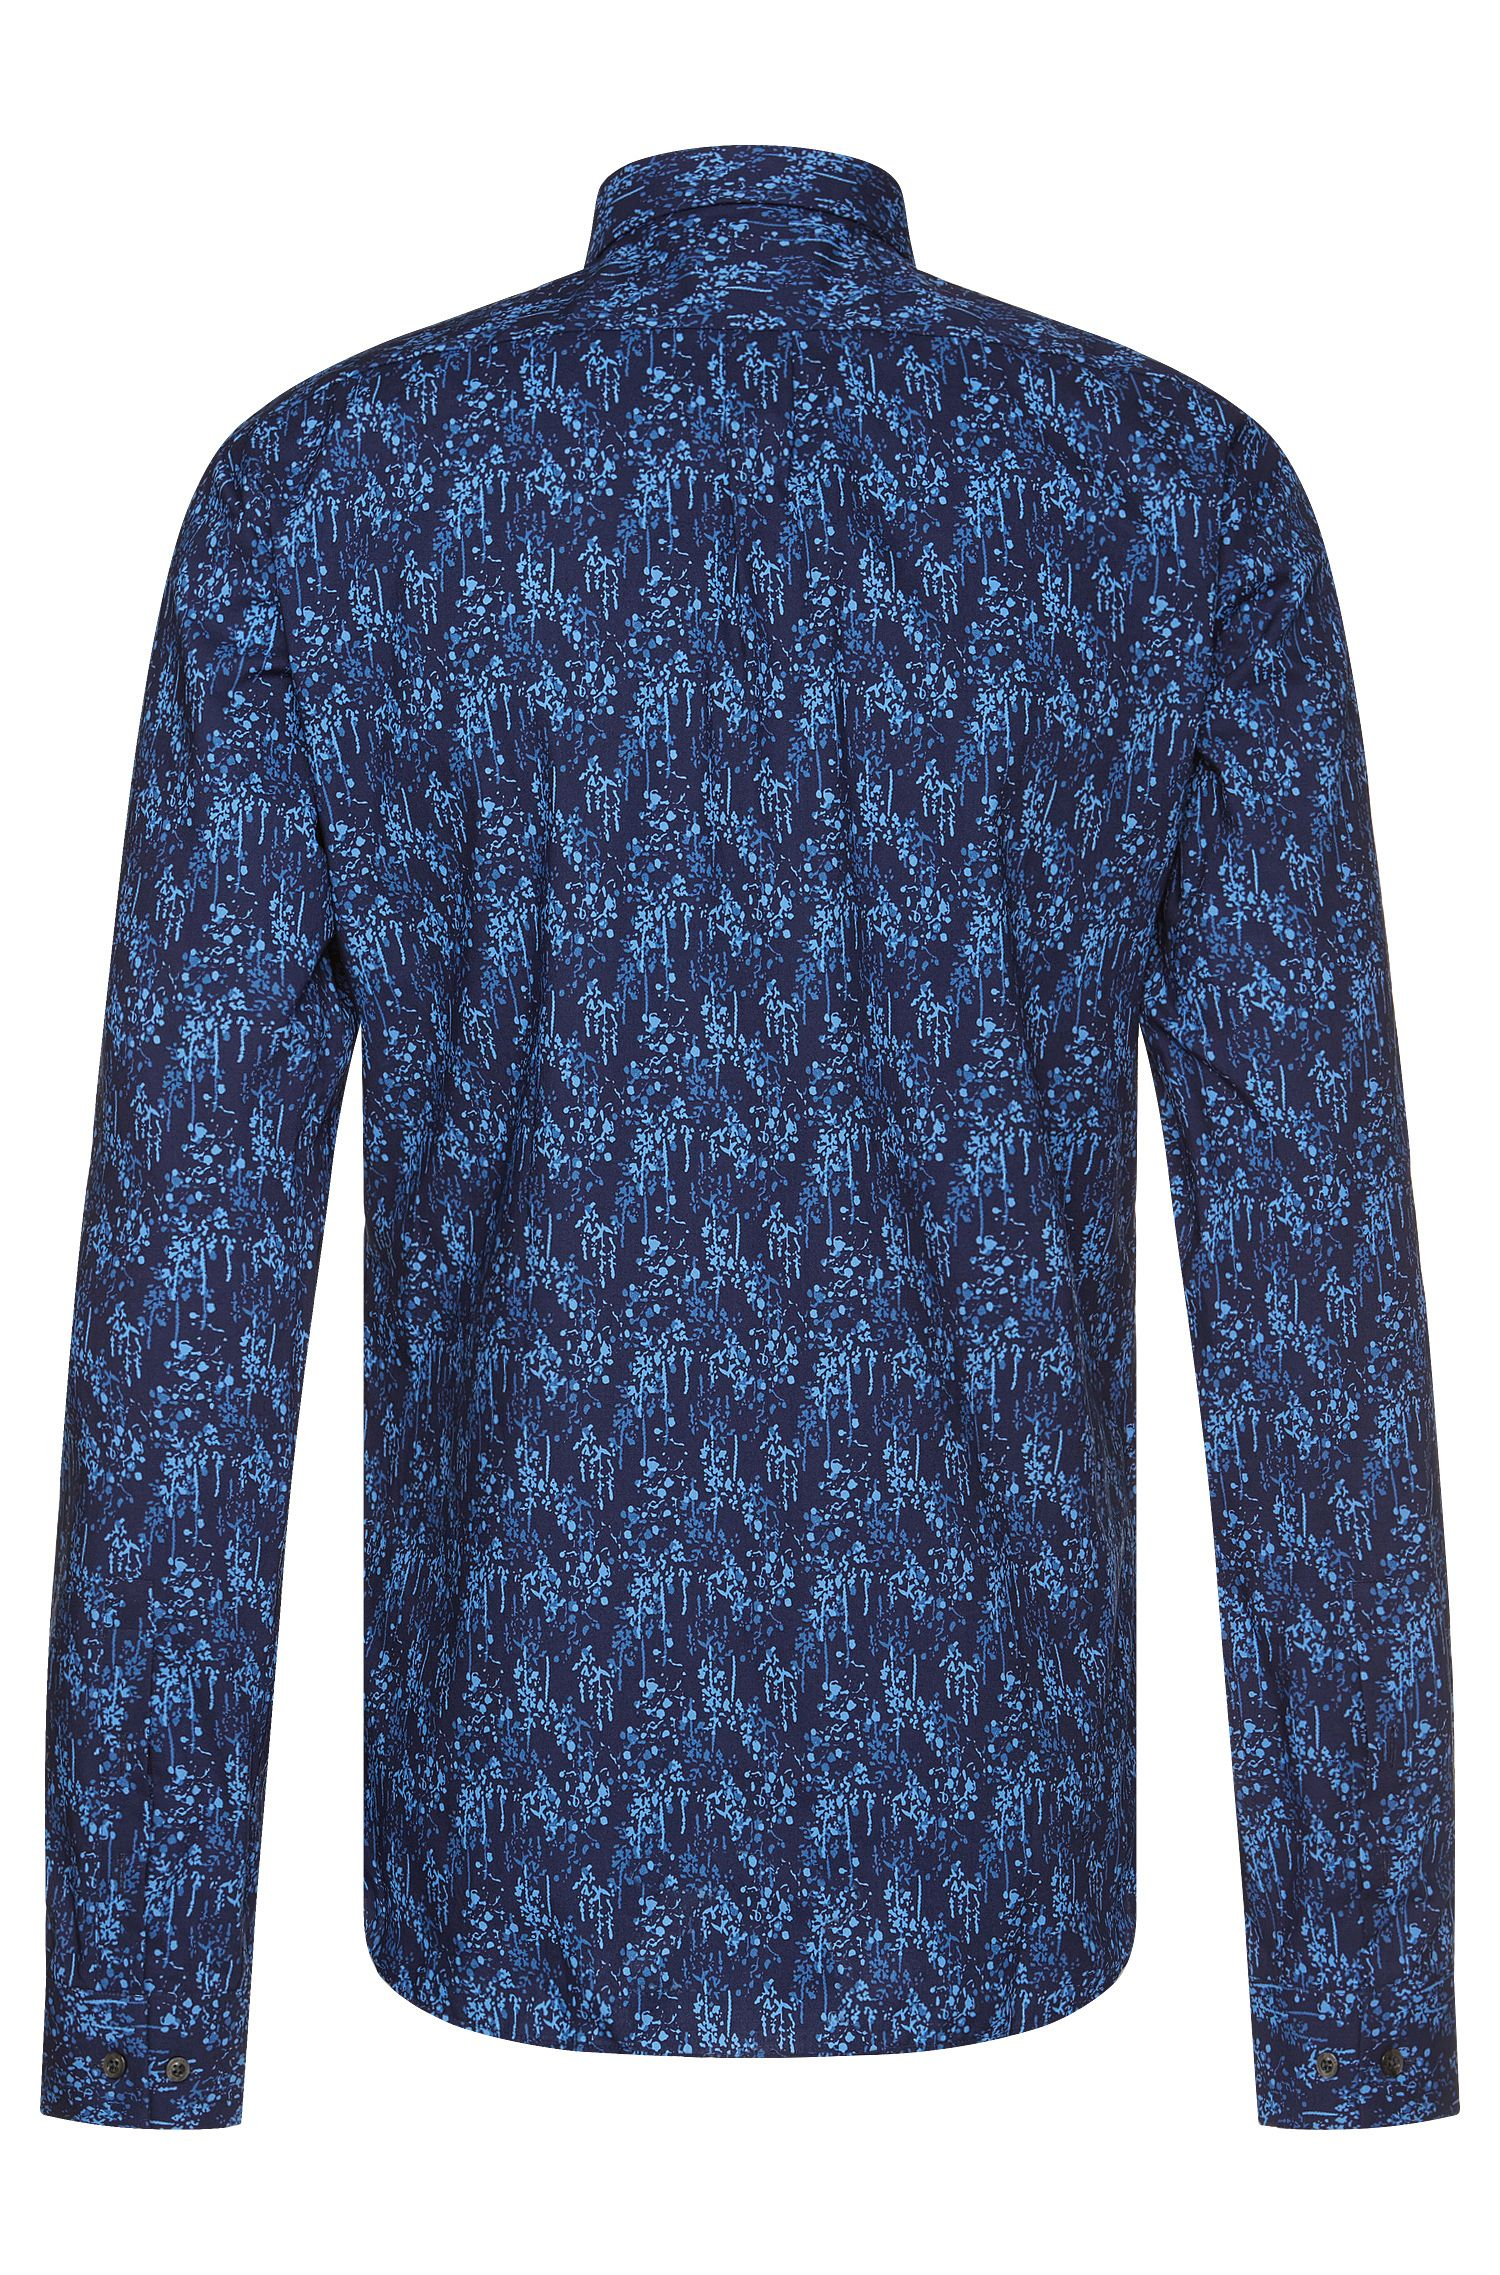 Stretch Cotton Printed Button Down Shirt, Slim Fit | Ero